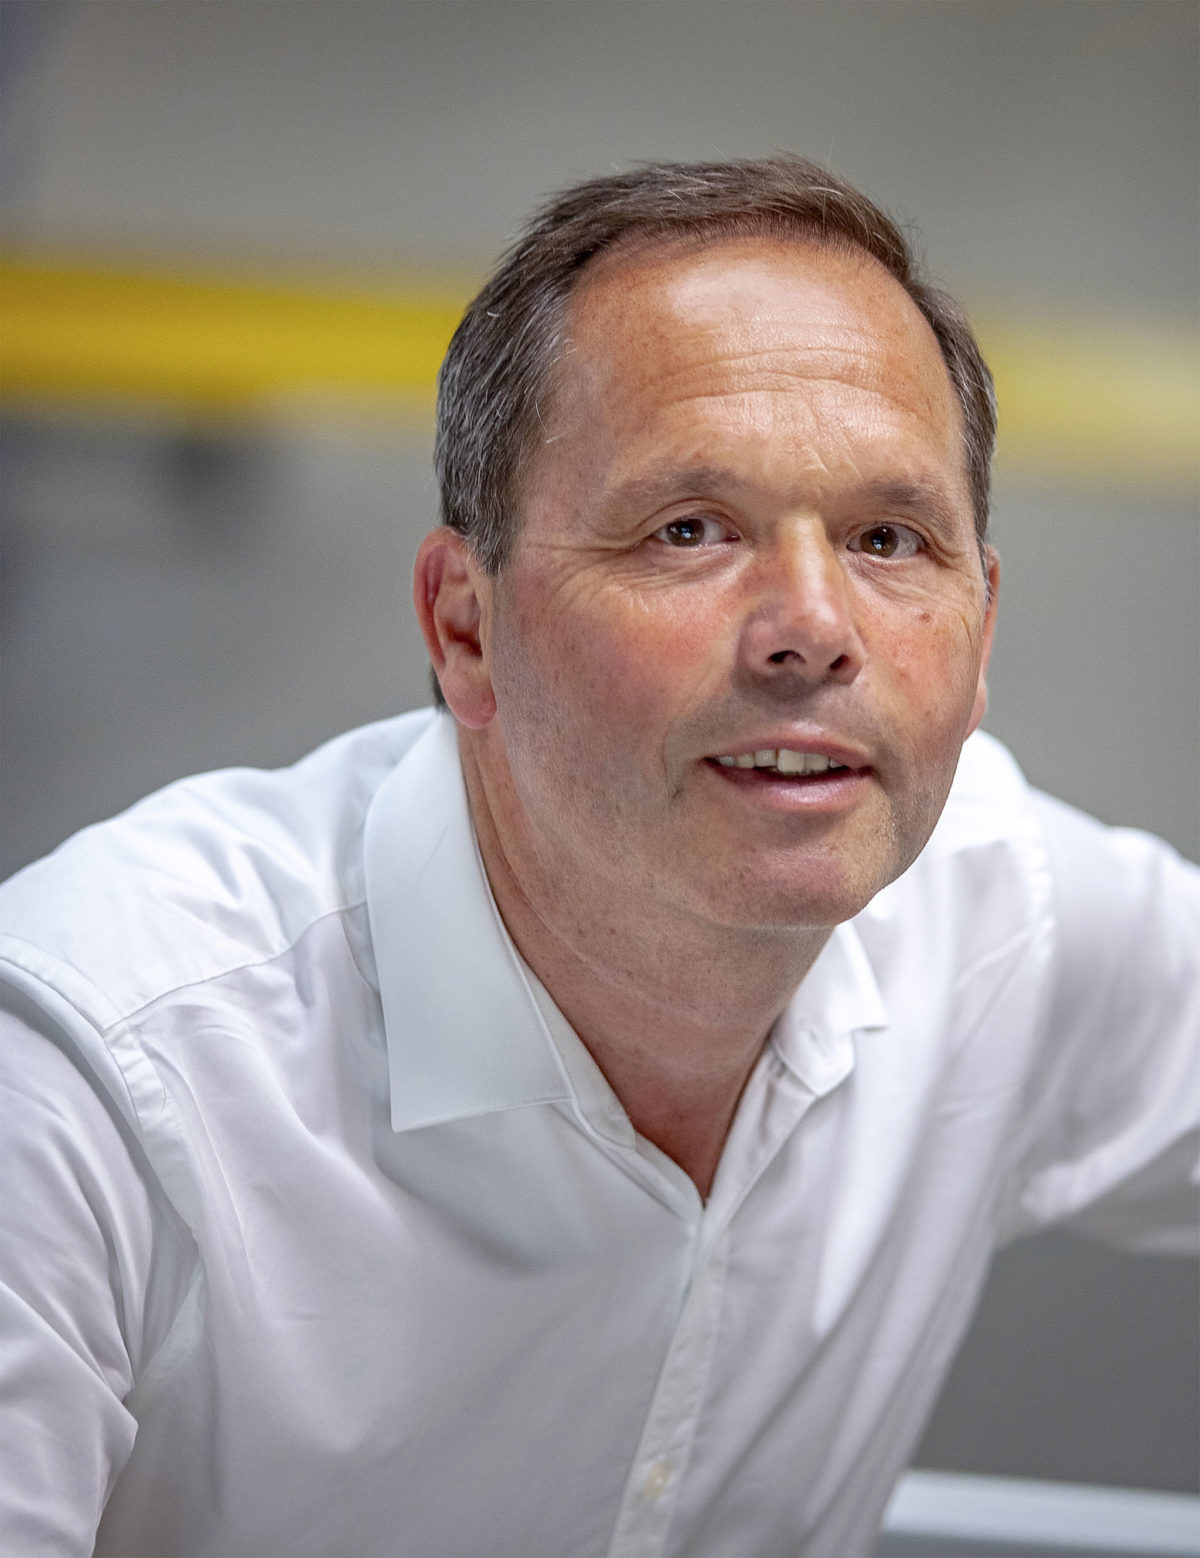 Wilco Kruitbosch, brand manager Cortina. Foto: Thijs Wolzak